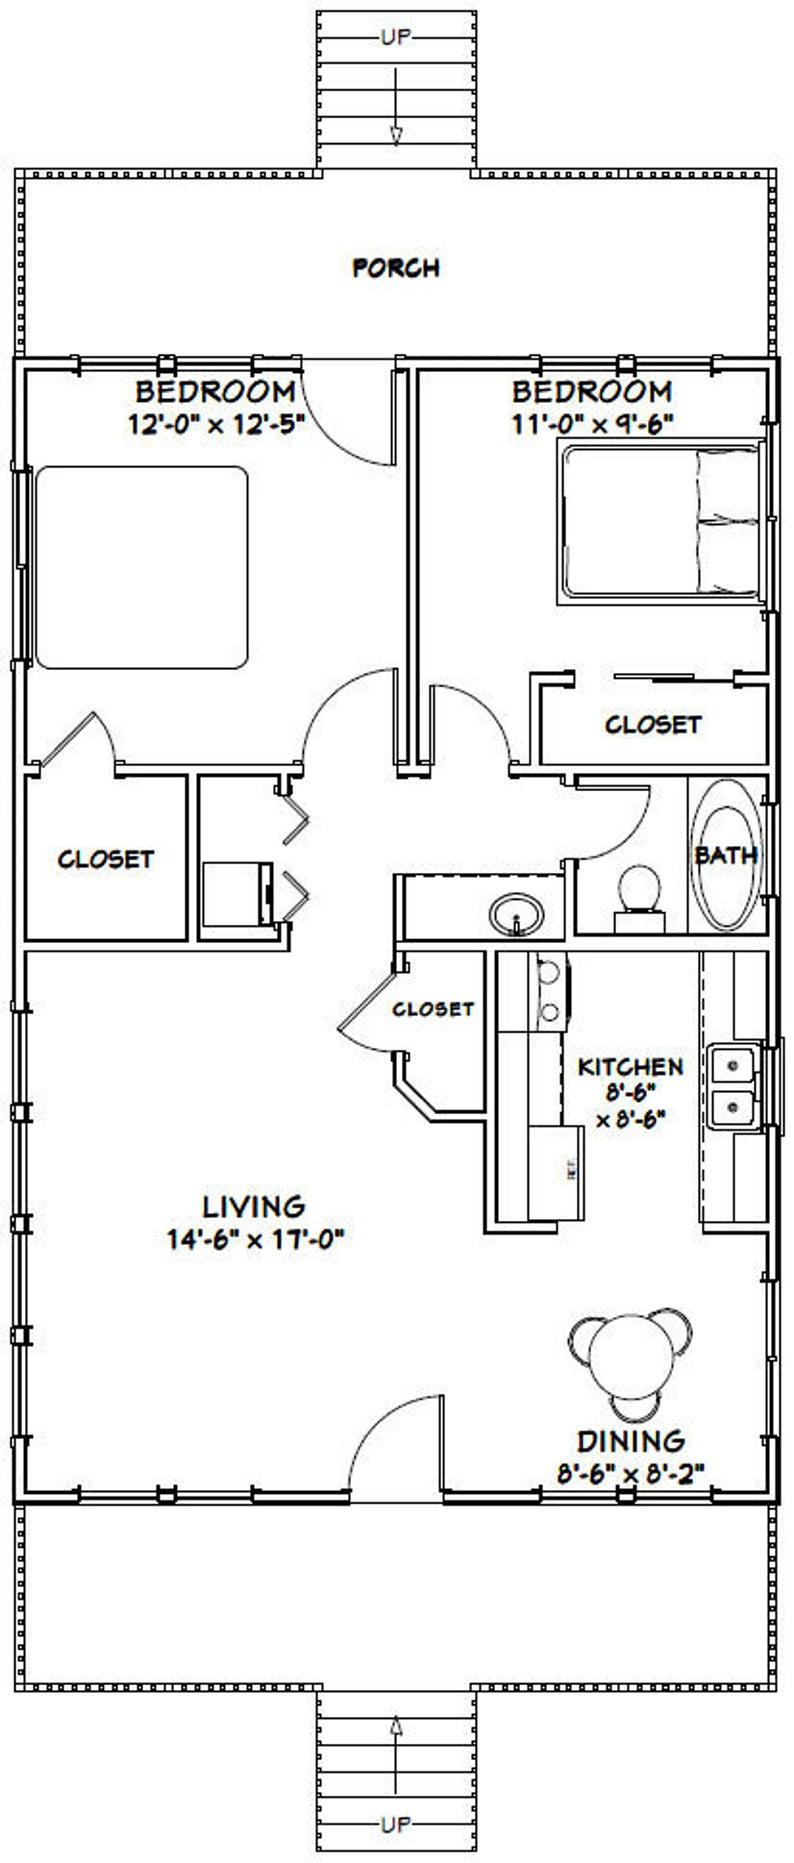 24x36 House 2 Bedroom 1 Bath 864 Sq Ft Pdf Floor Plan Etsy In 2020 Small House Plans Small House Floor Plans Bedroom House Plans